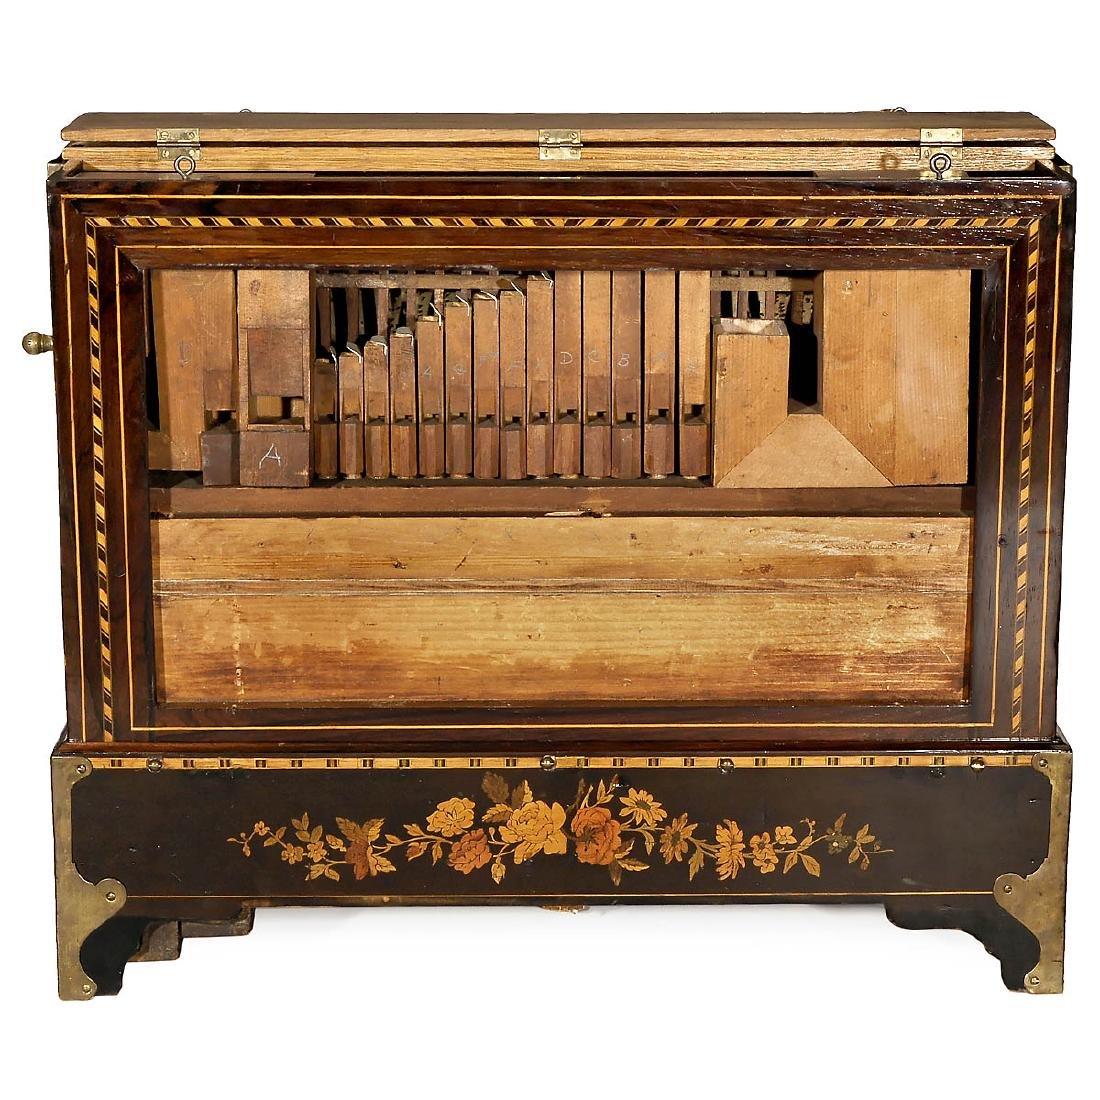 Early Street Barrel Organ, c. 1890 - 2